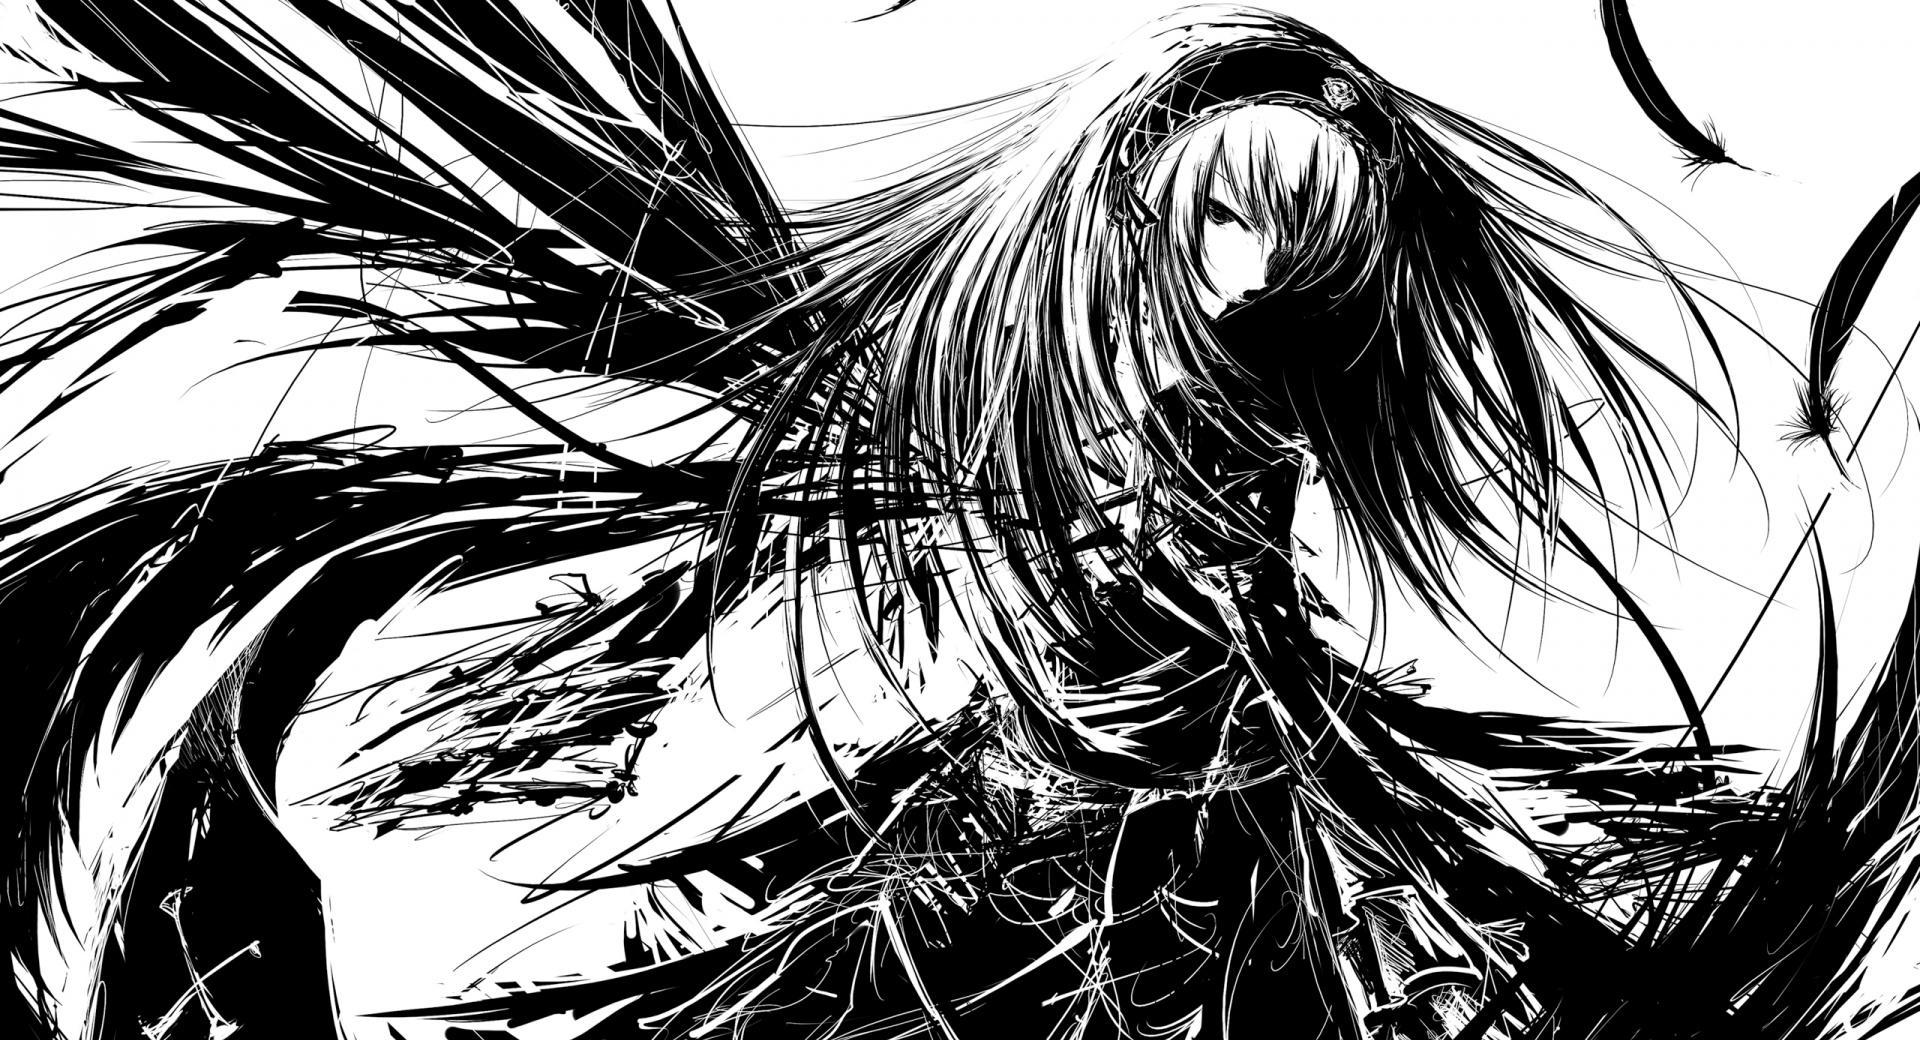 Girl Manga BW wallpapers HD quality